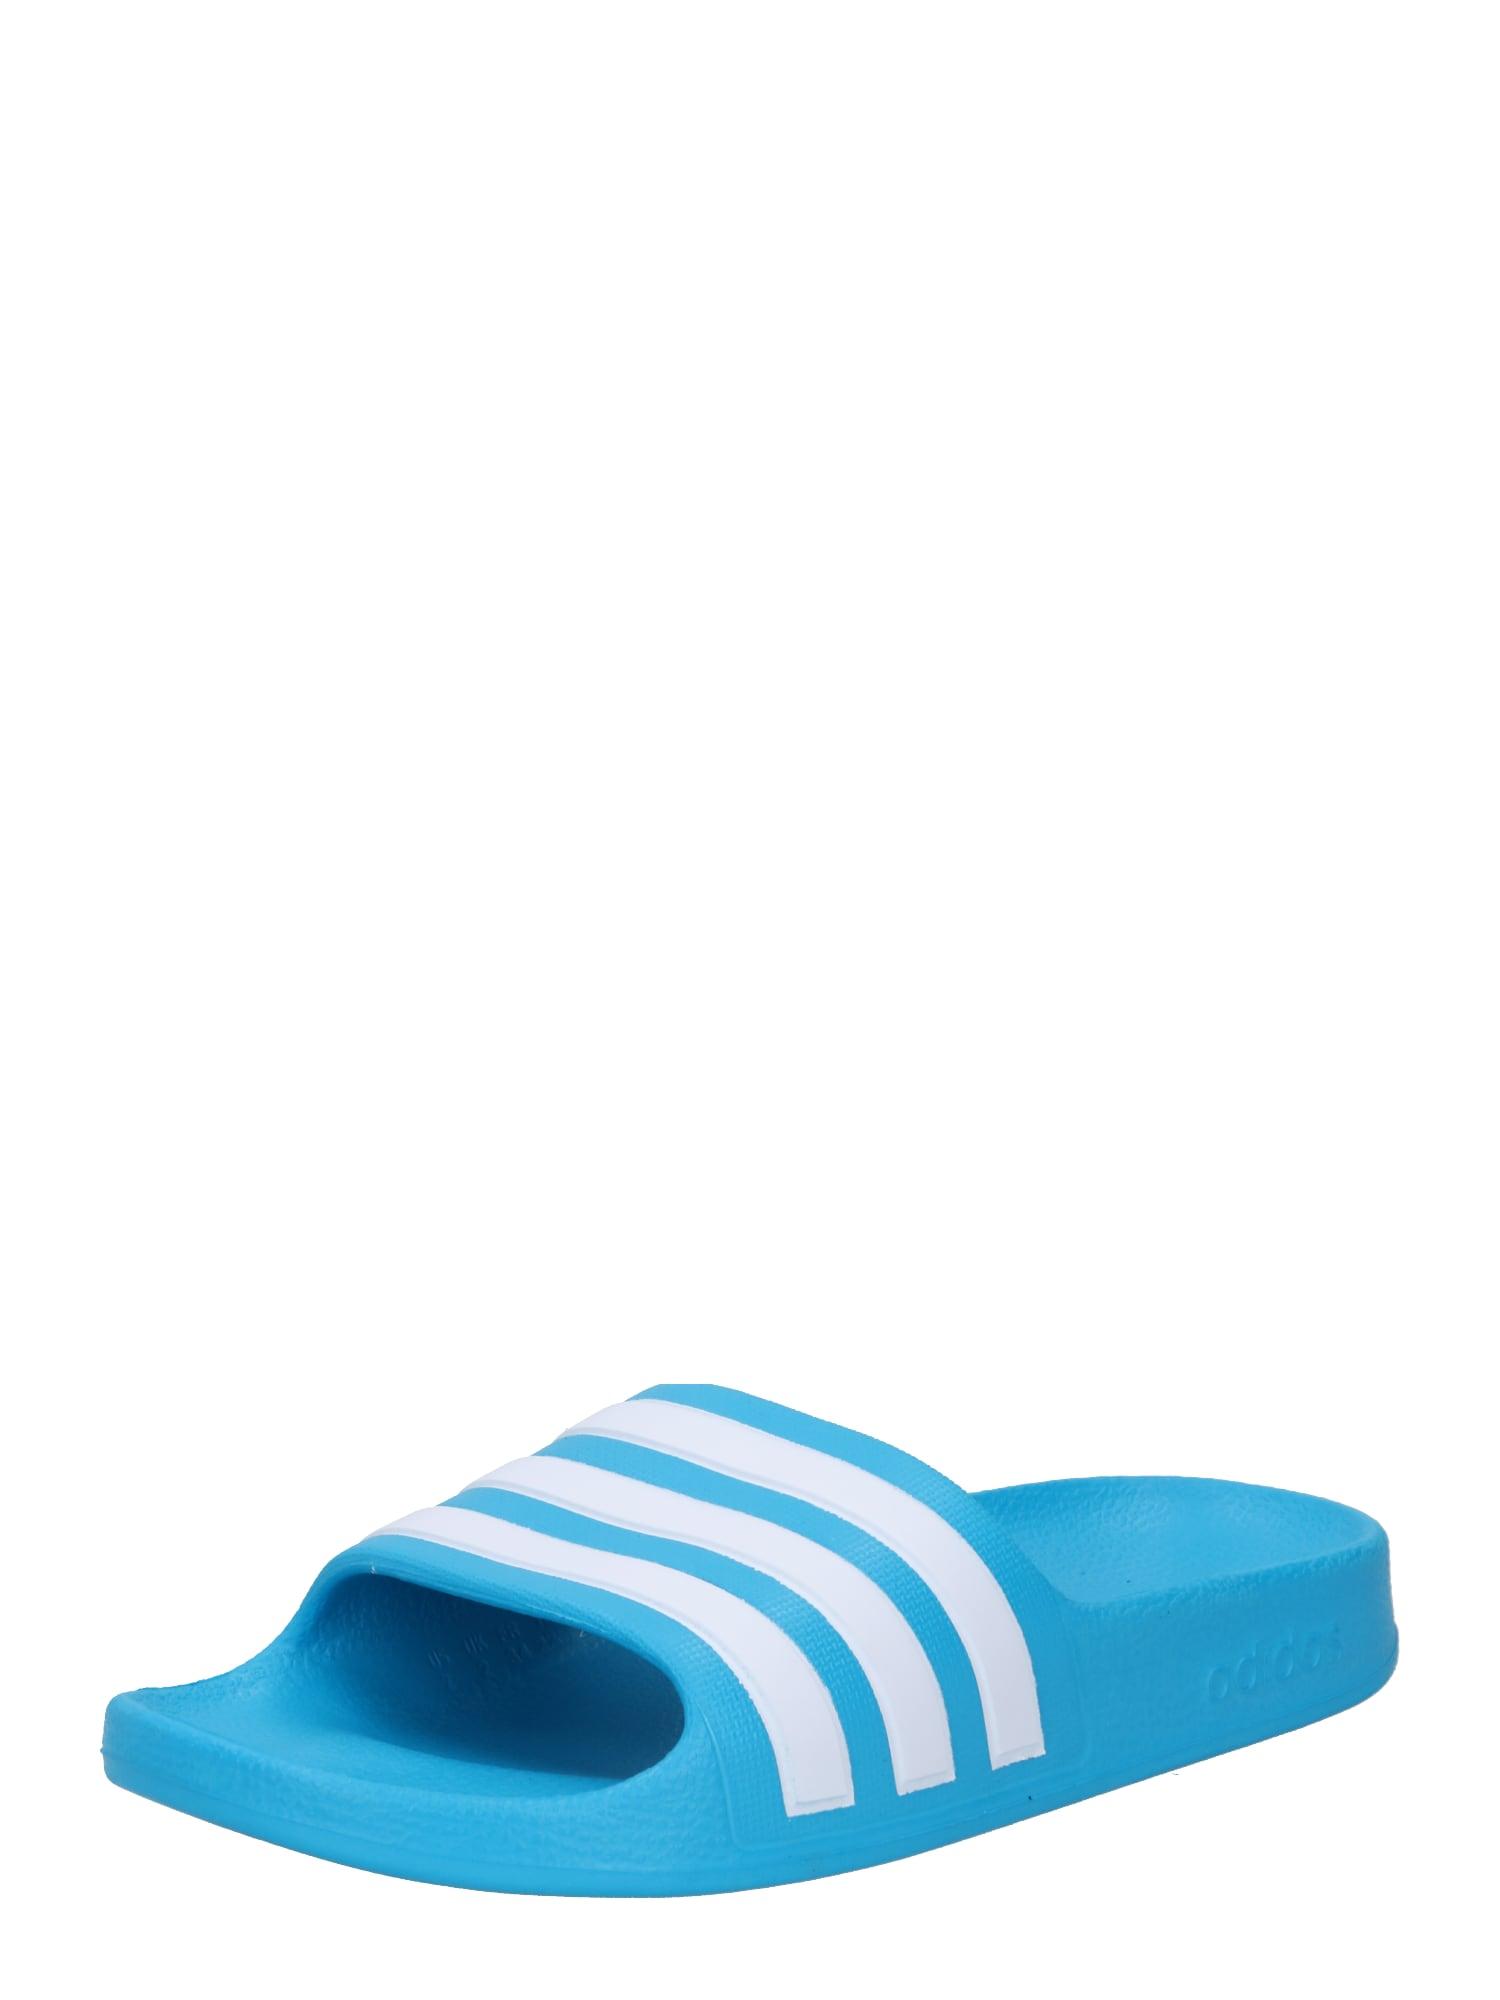 ADIDAS PERFORMANCE Sandalai / maudymosi batai 'ADILETTE' balta / vandens spalva